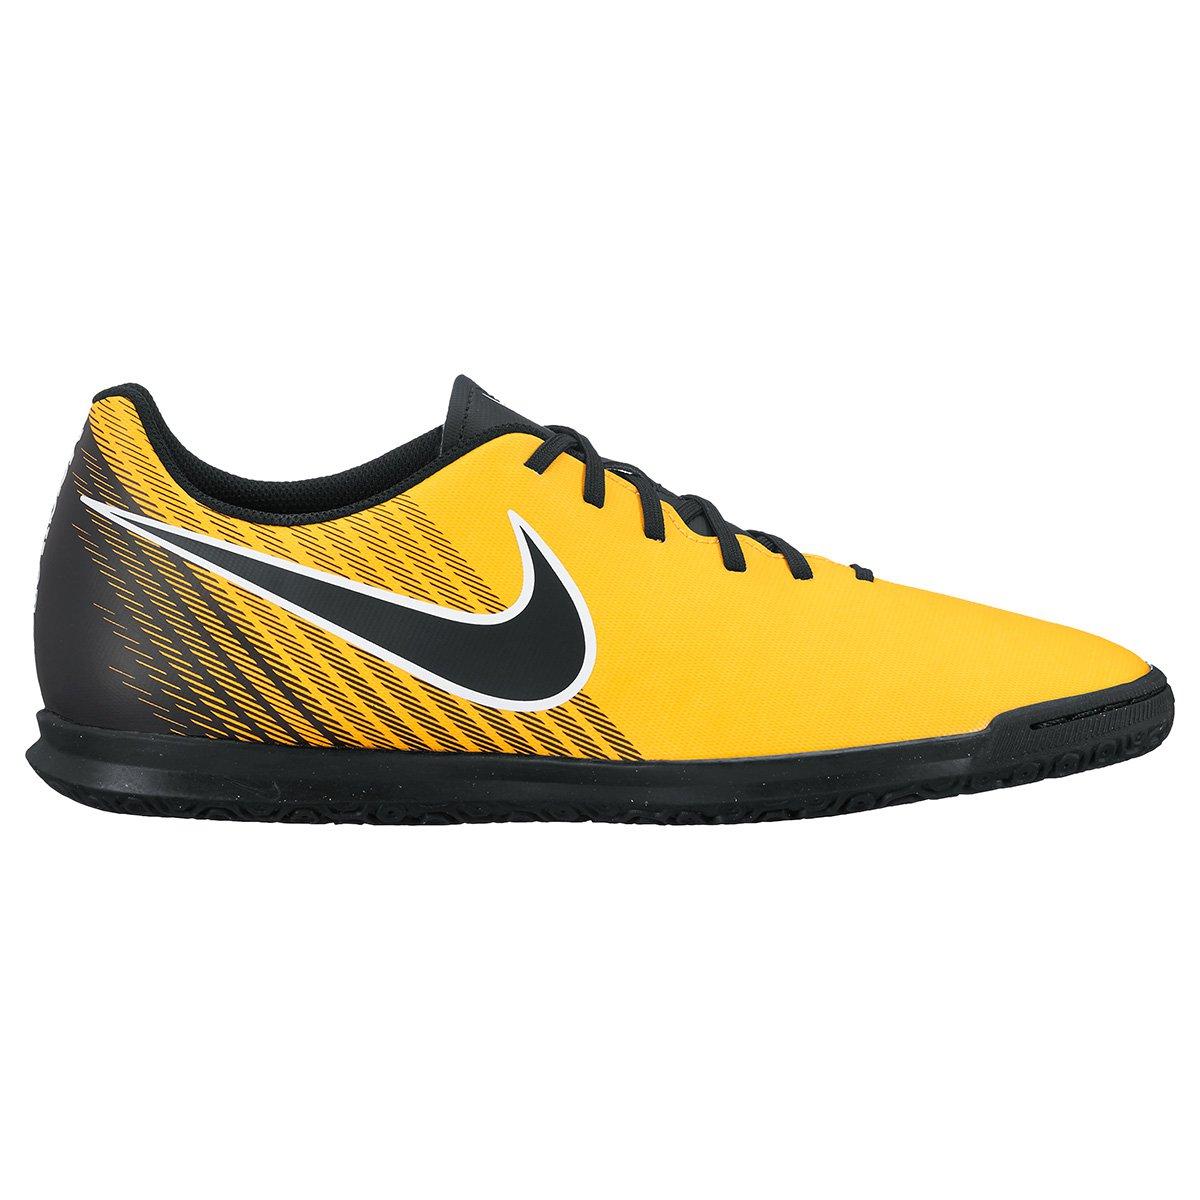 Chuteira Futsal Nike Magista Ola II IC - Compre Agora  1de2b6ca9b074